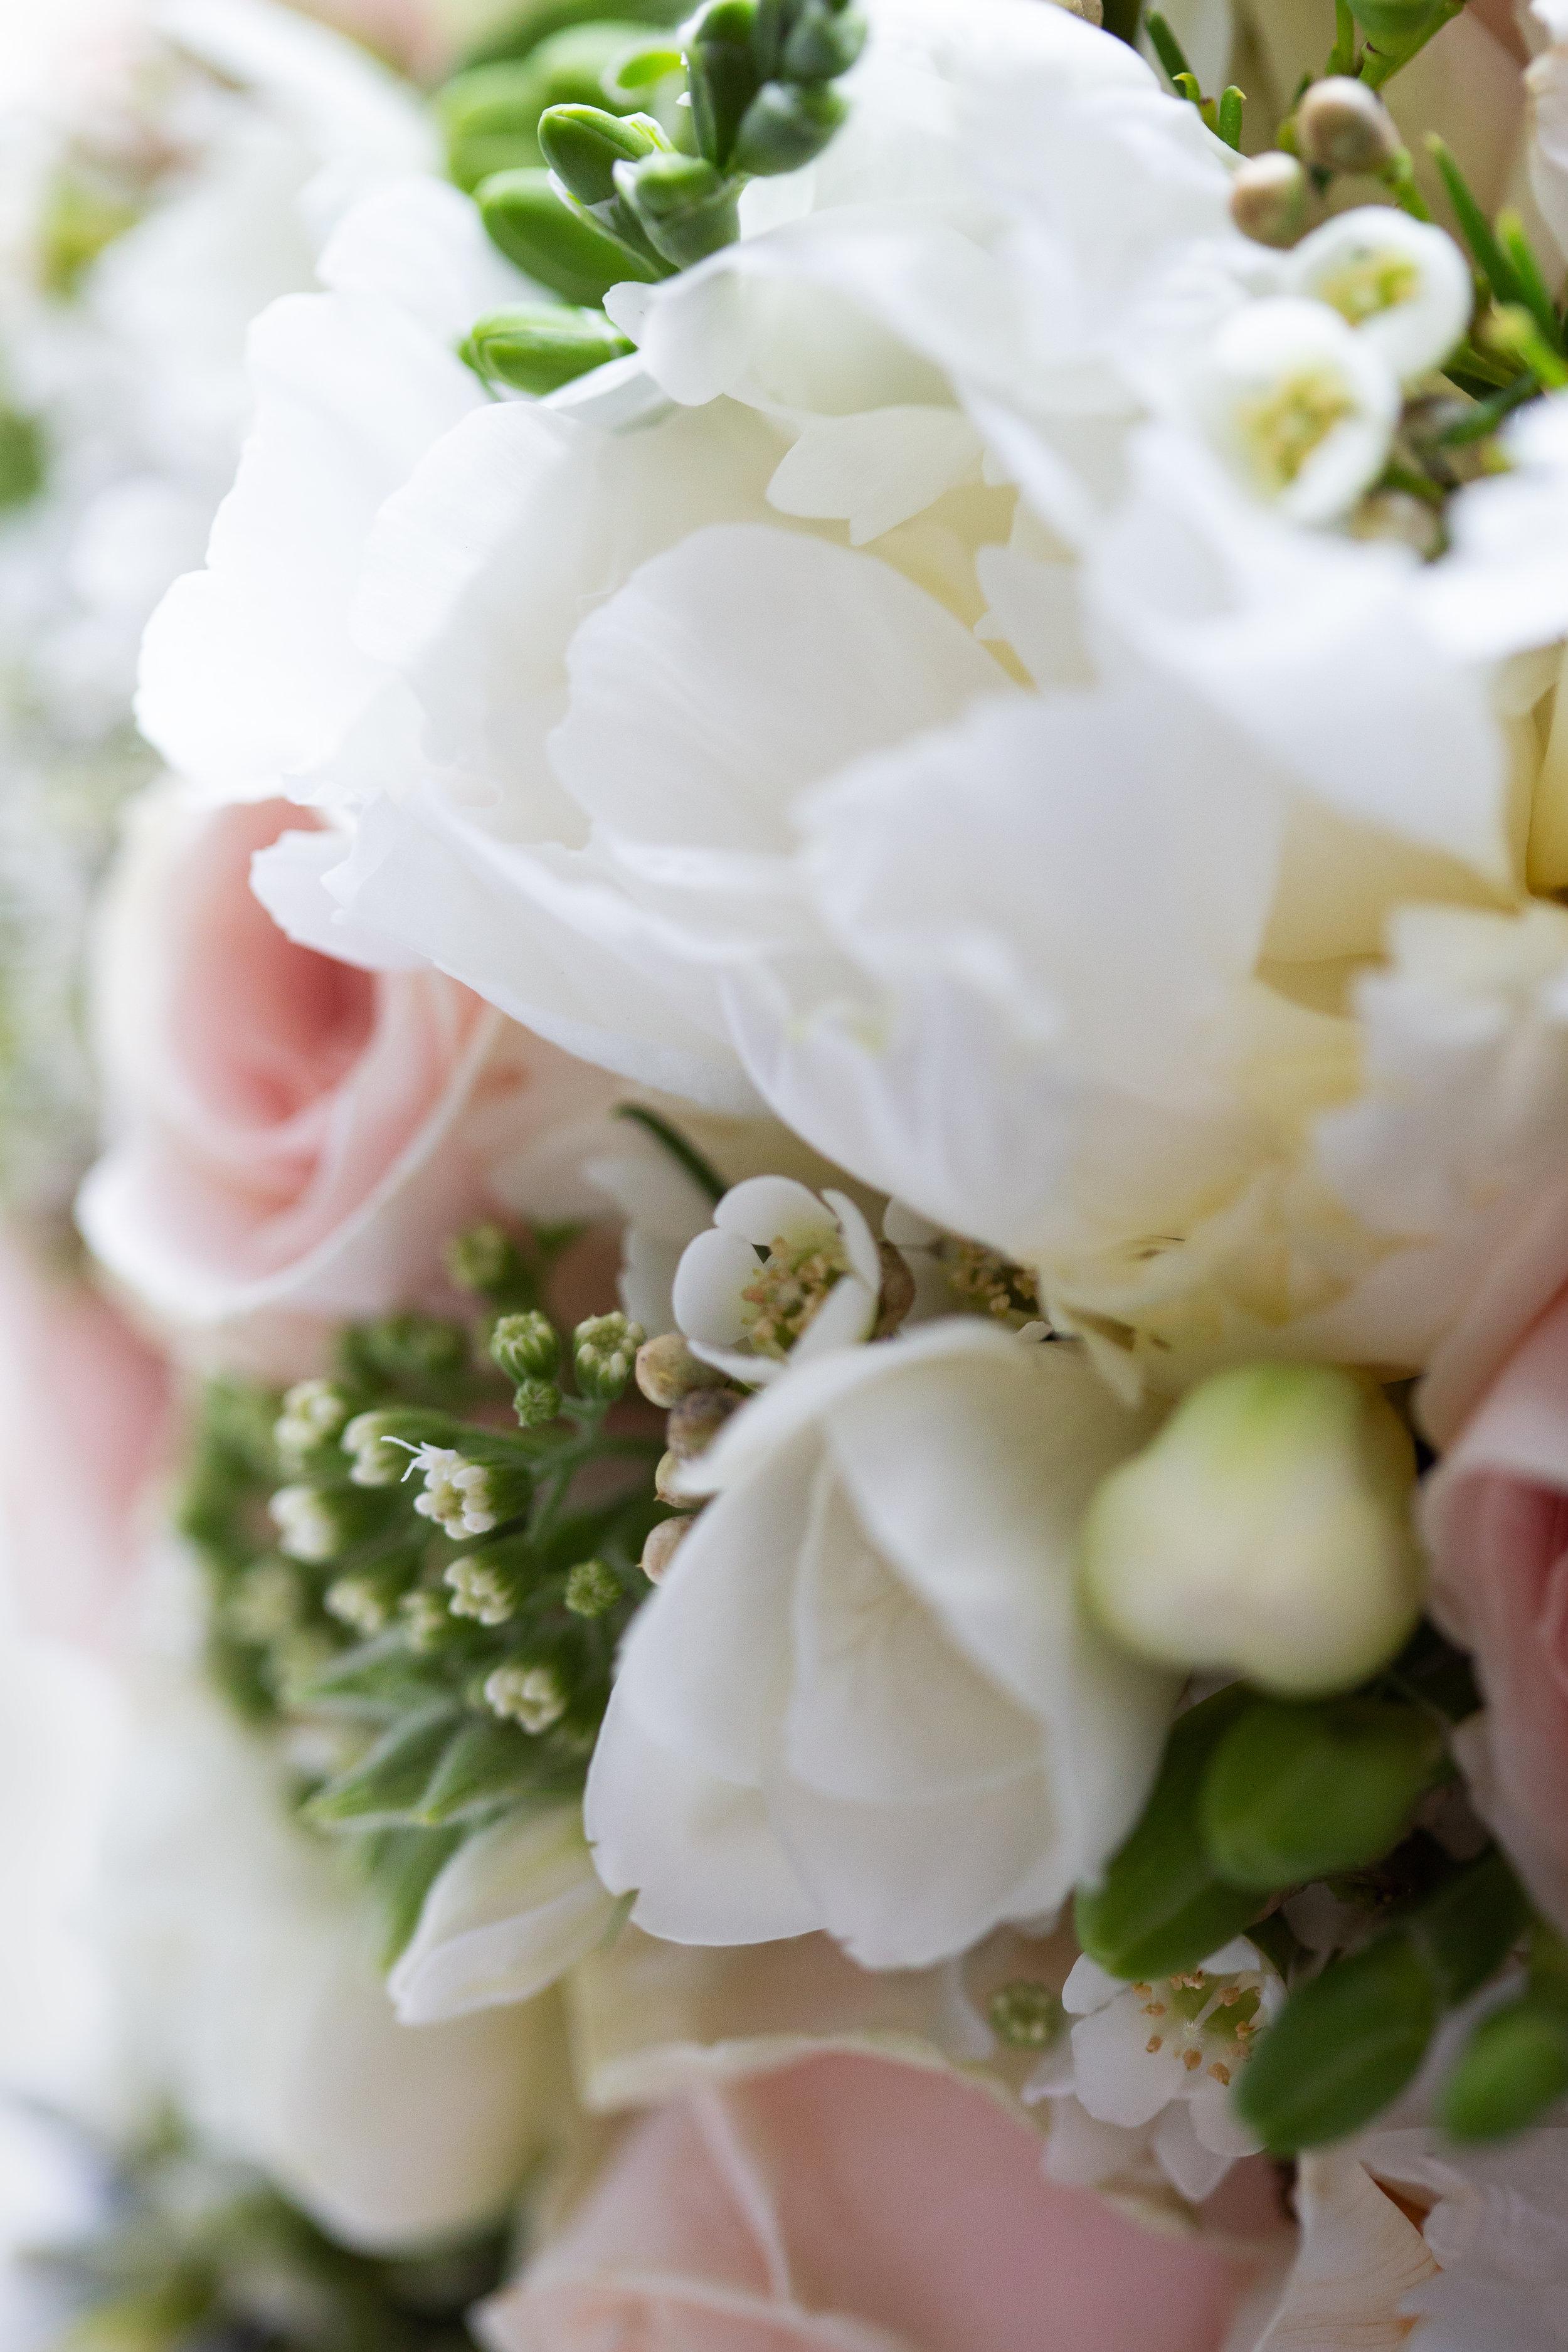 wedding-lea-cooper-photography-willenhall-west-midlands-wolverhampton-dudley-birmingham-uk-marriage-hadley-park-east-telford-flower-details.jpg